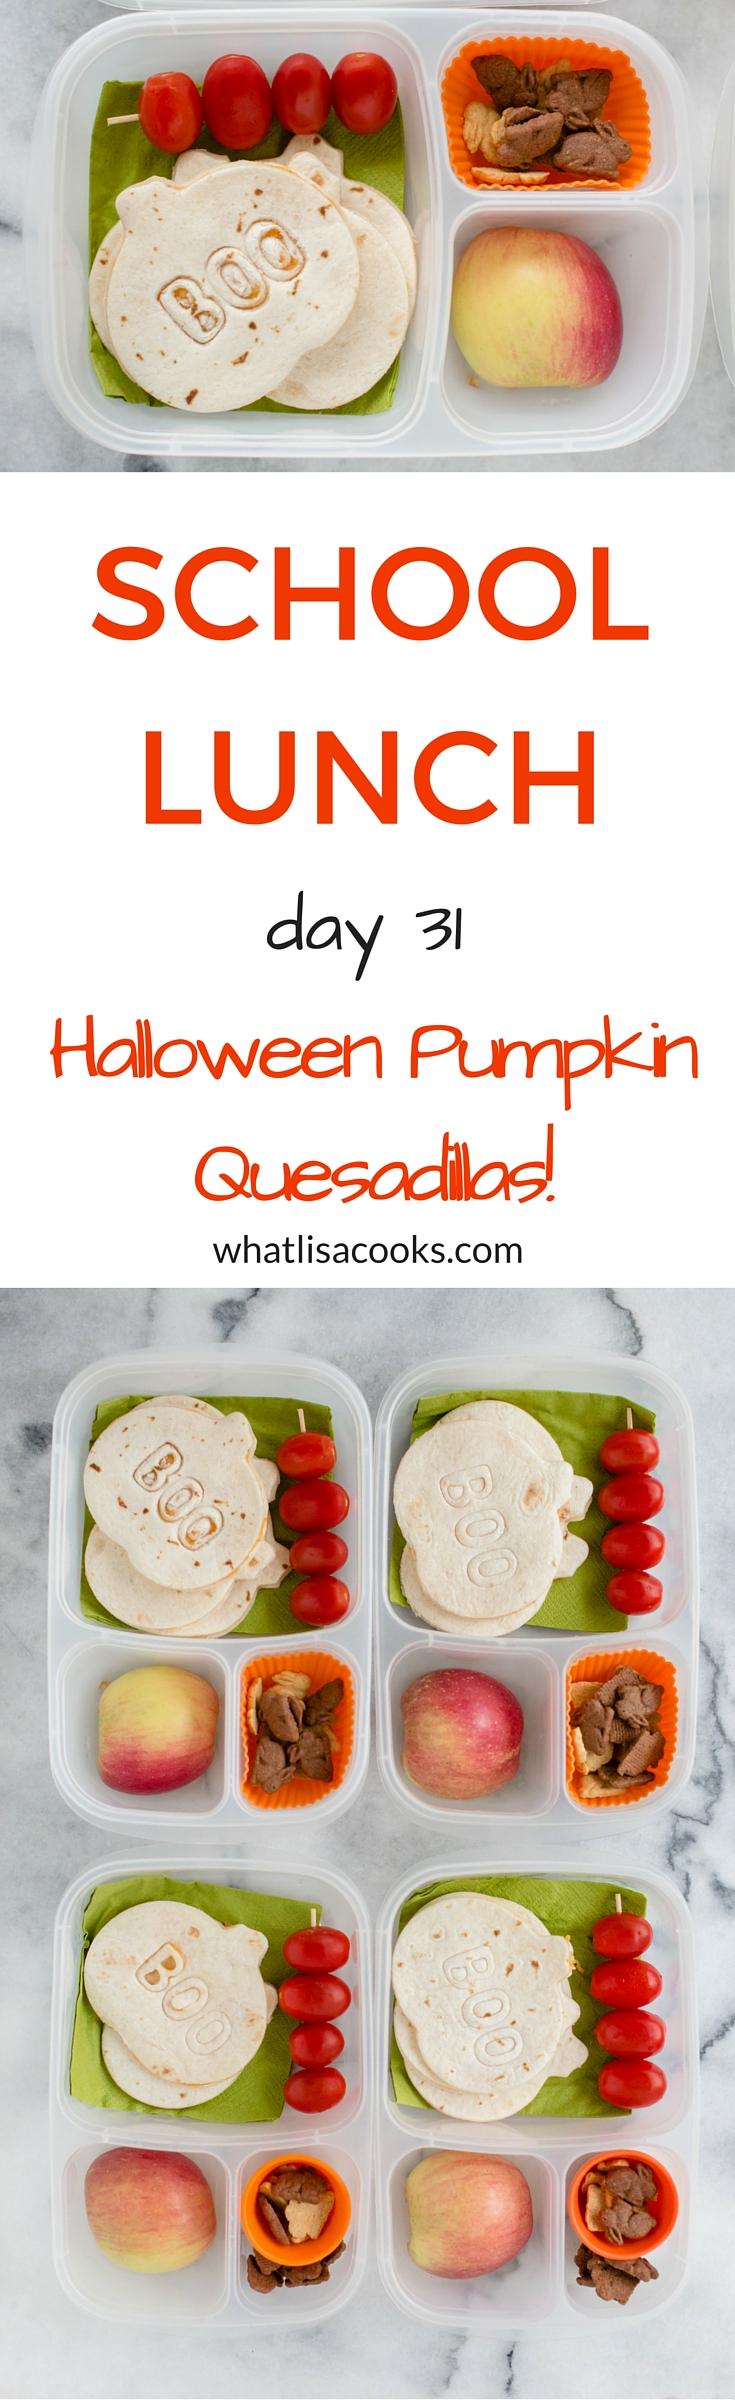 Easy Halloween Pumpkin School Lunch Idea from whatlisacooks.com